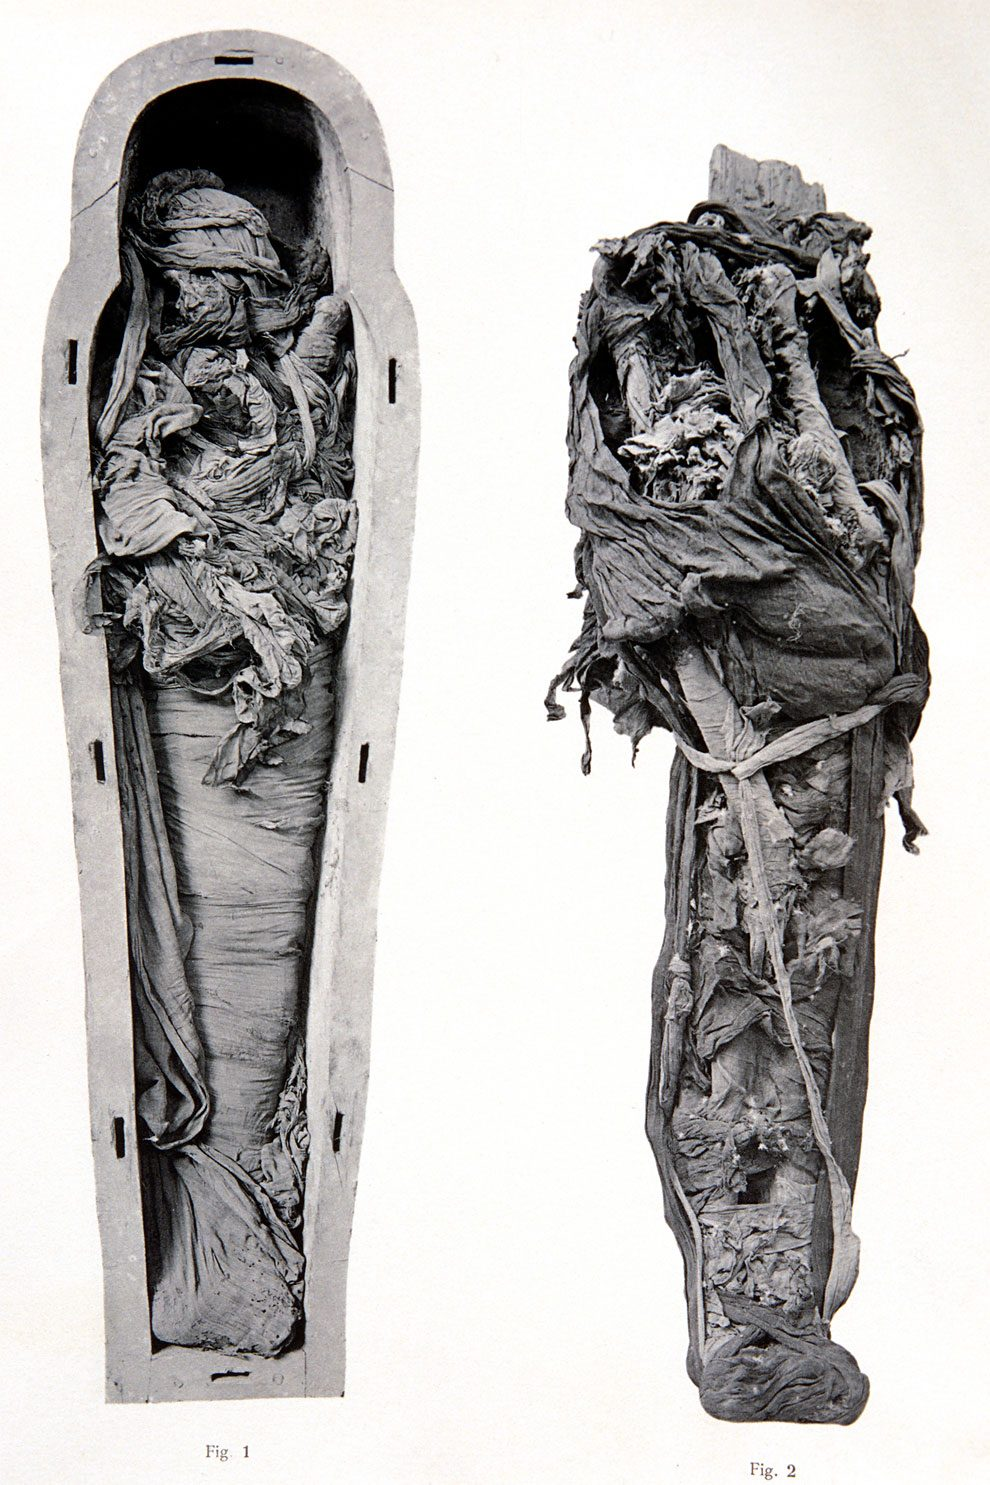 mummie-egiziane-foto-museo-cairo-06